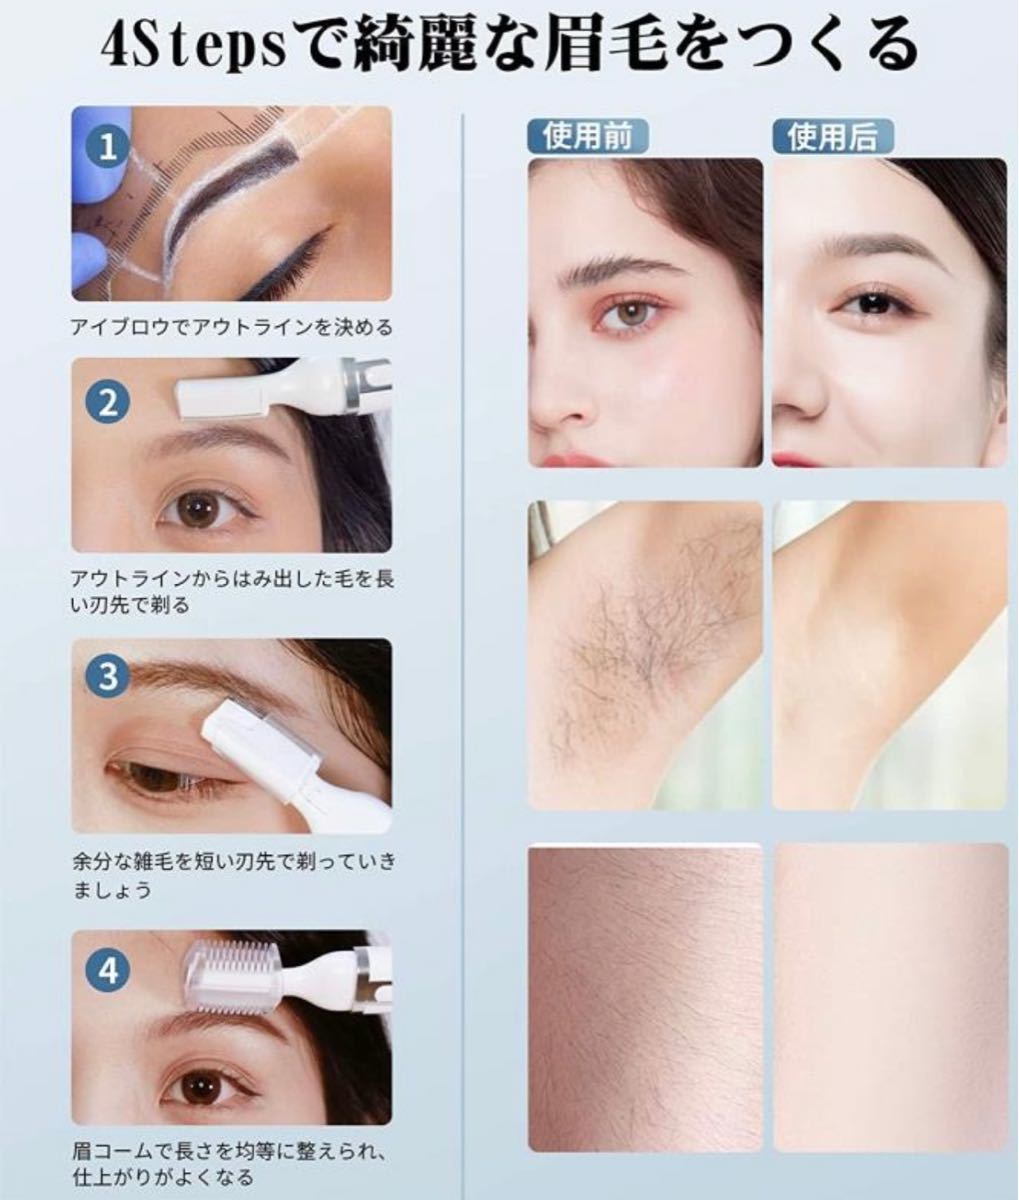 ANLAN眉毛シェーバー電動 女性メンズ 眉毛カッター Type-C USB充電式 LEDライト付き 替え刃付き 男性 眉毛剃り